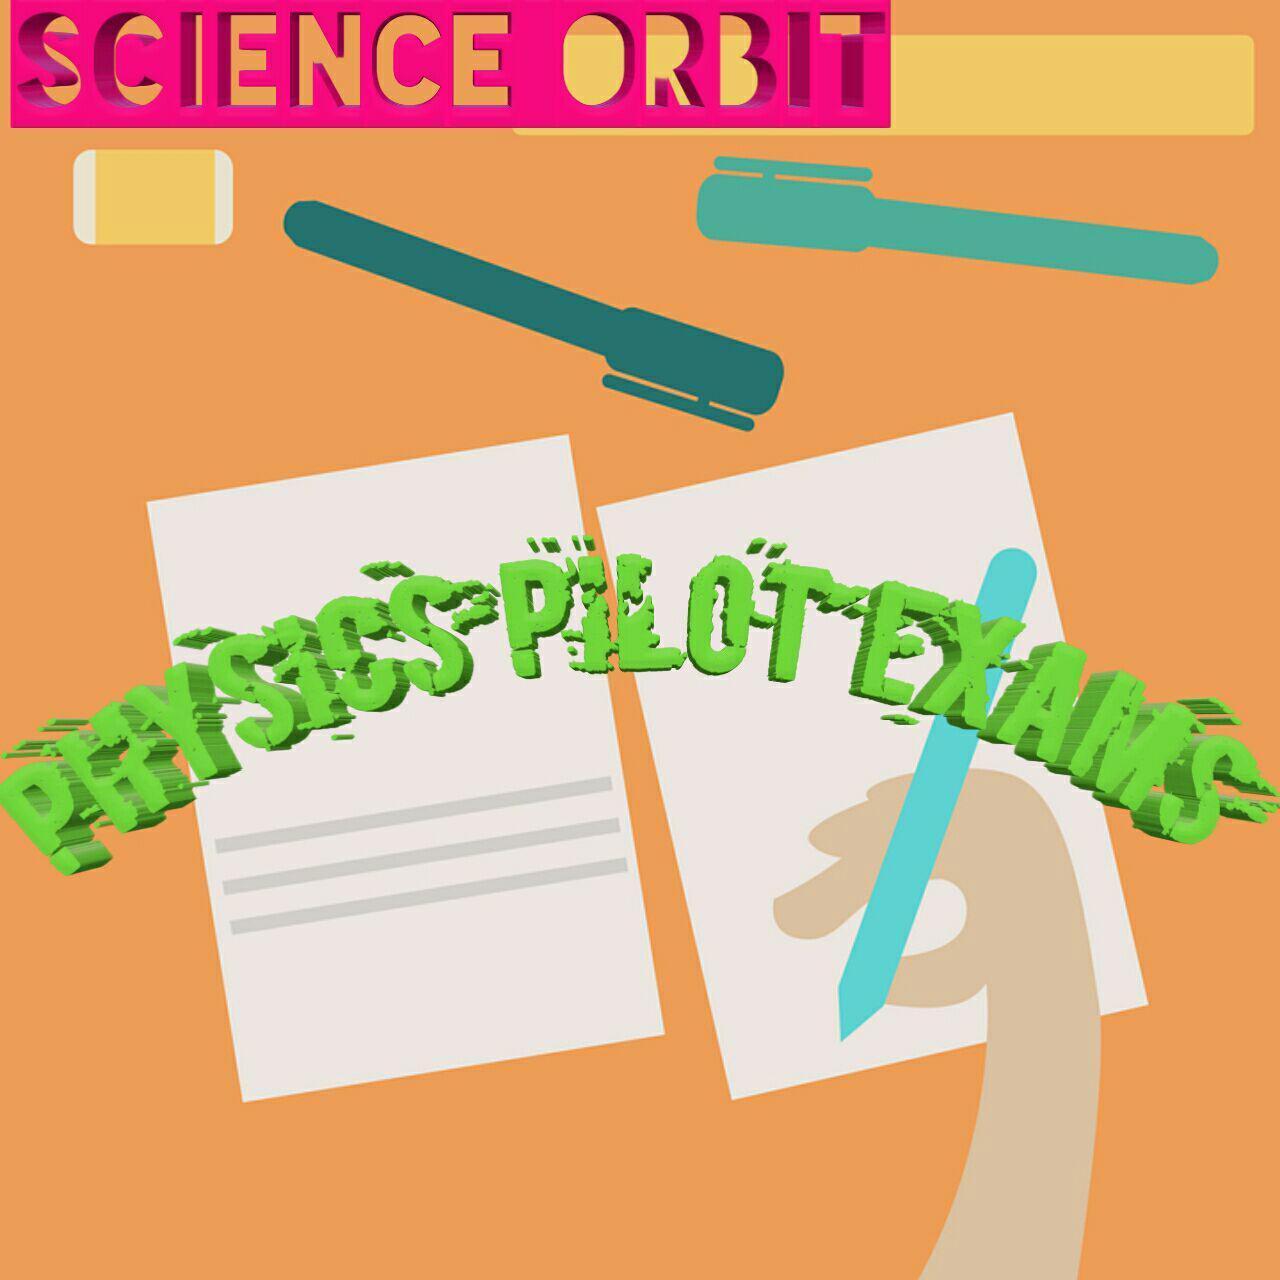 PHYSICS PILOT EXAM PAPERS - SCIENCE ORBIT